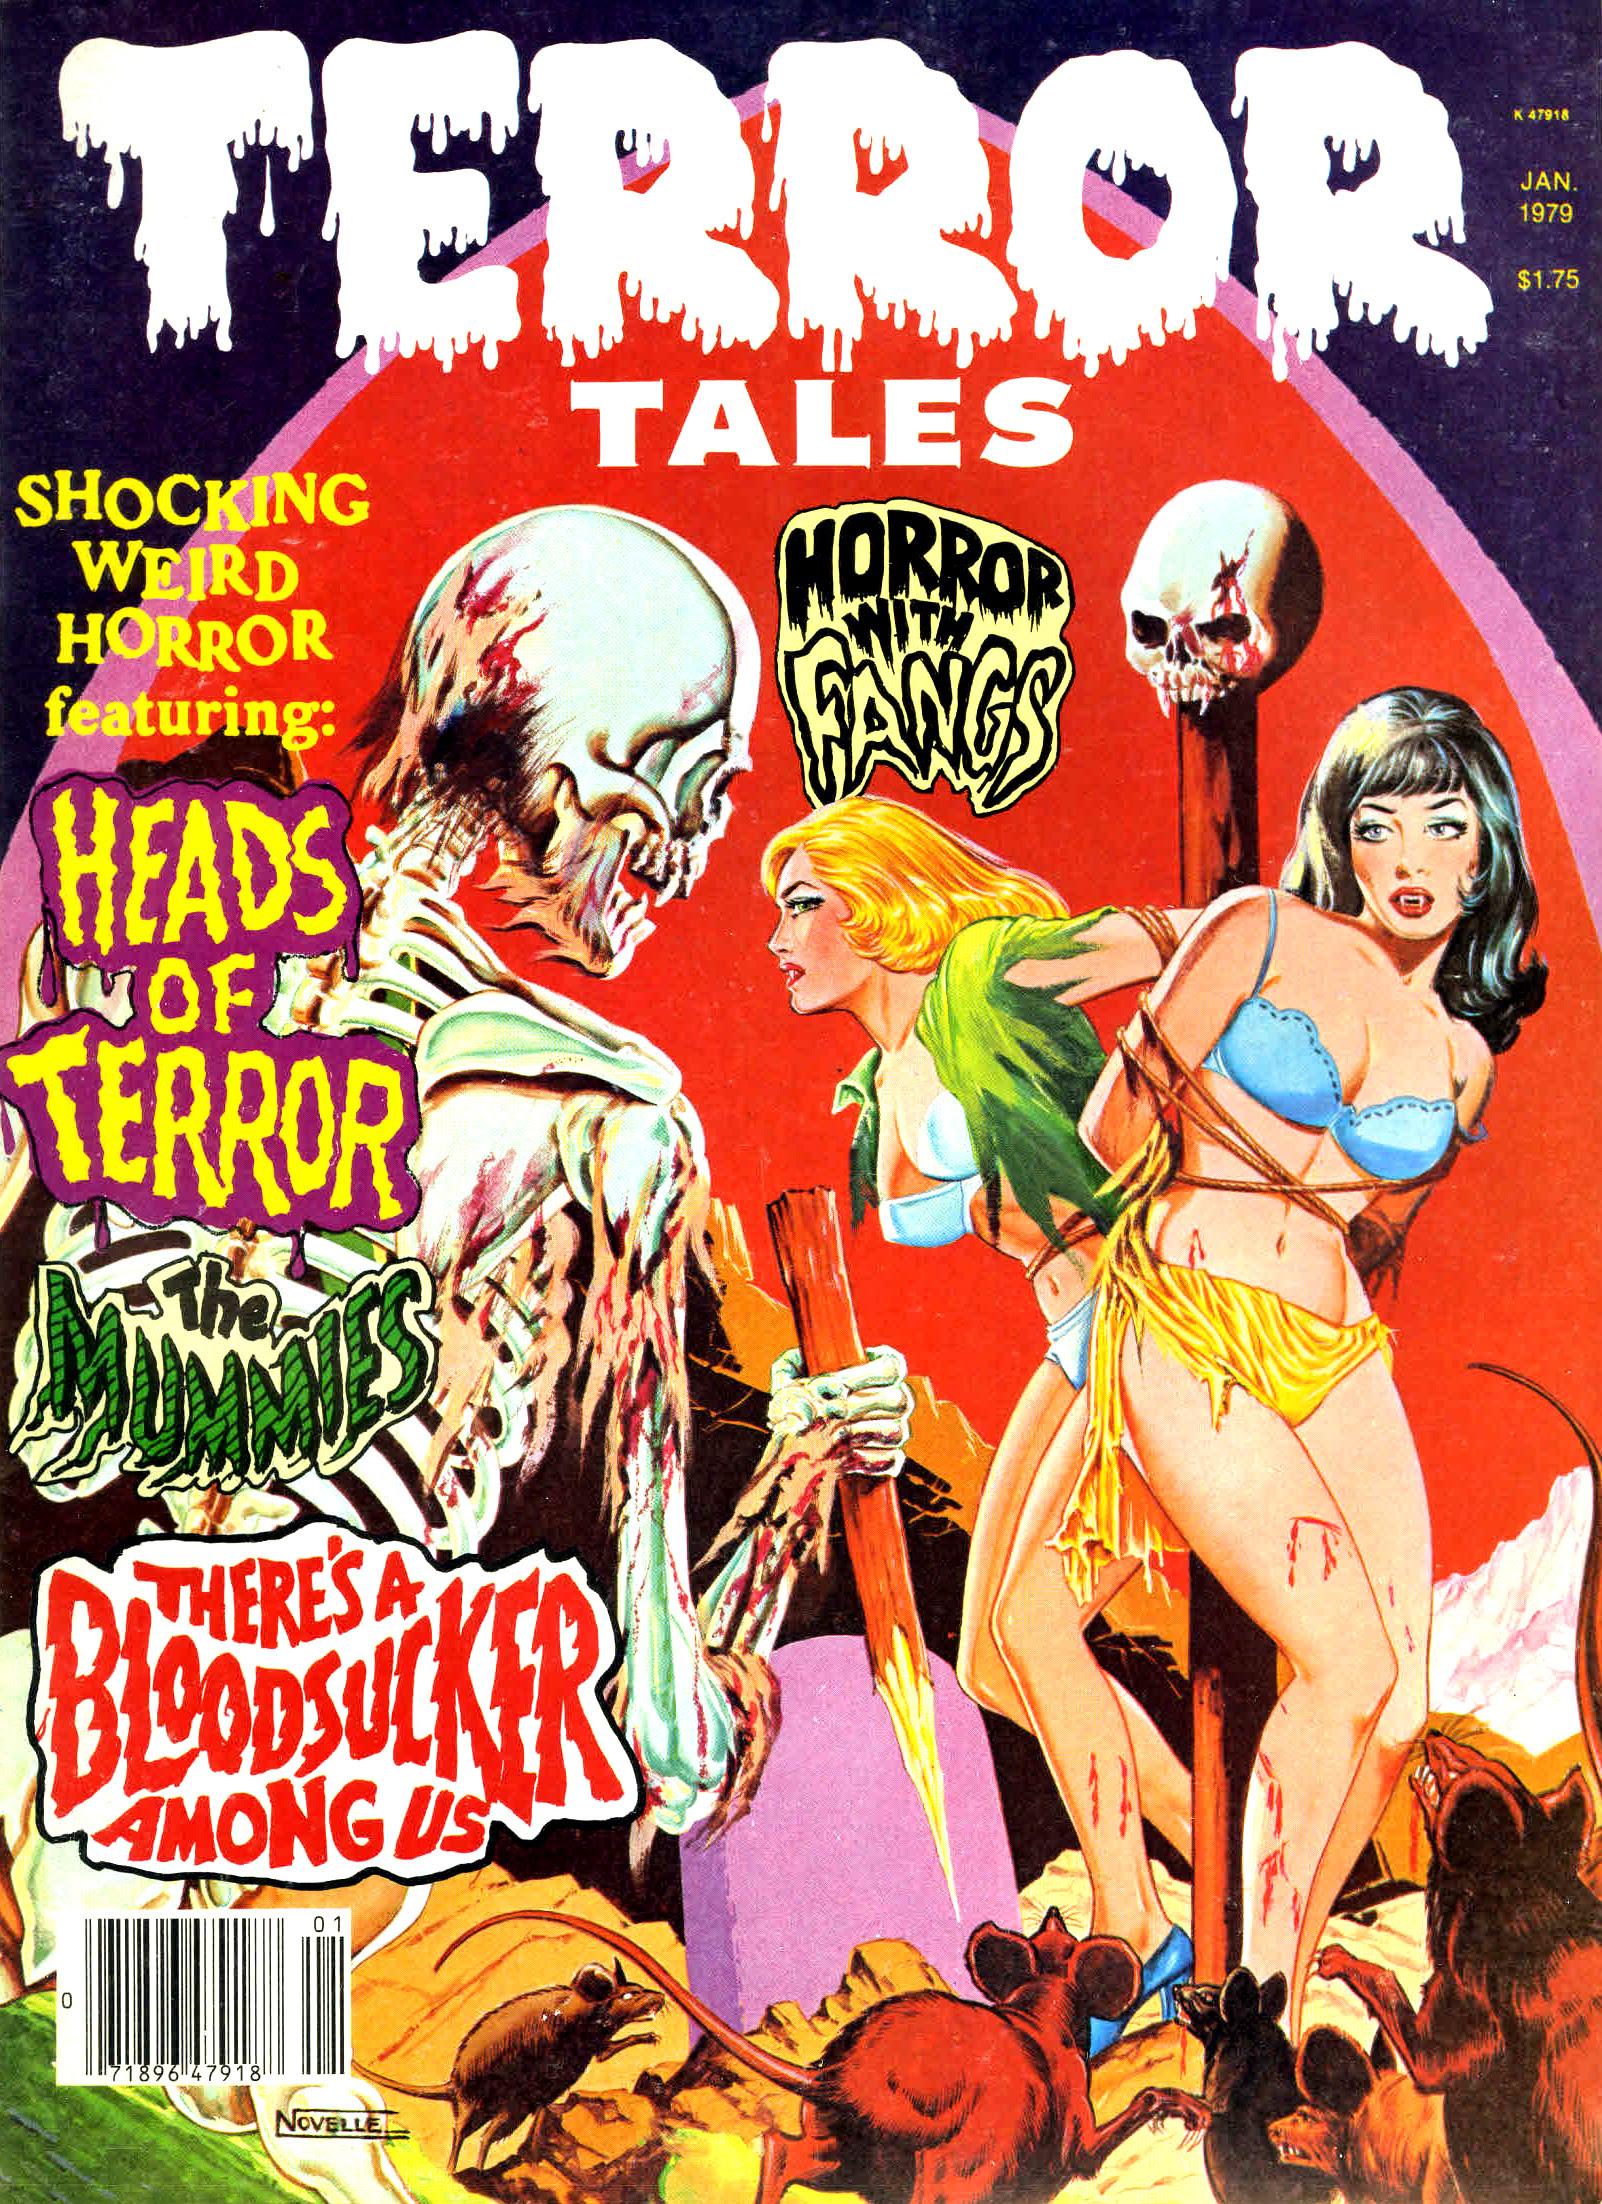 Terror Tales Vol. 10 #1 (Eerie Publications, 1979)